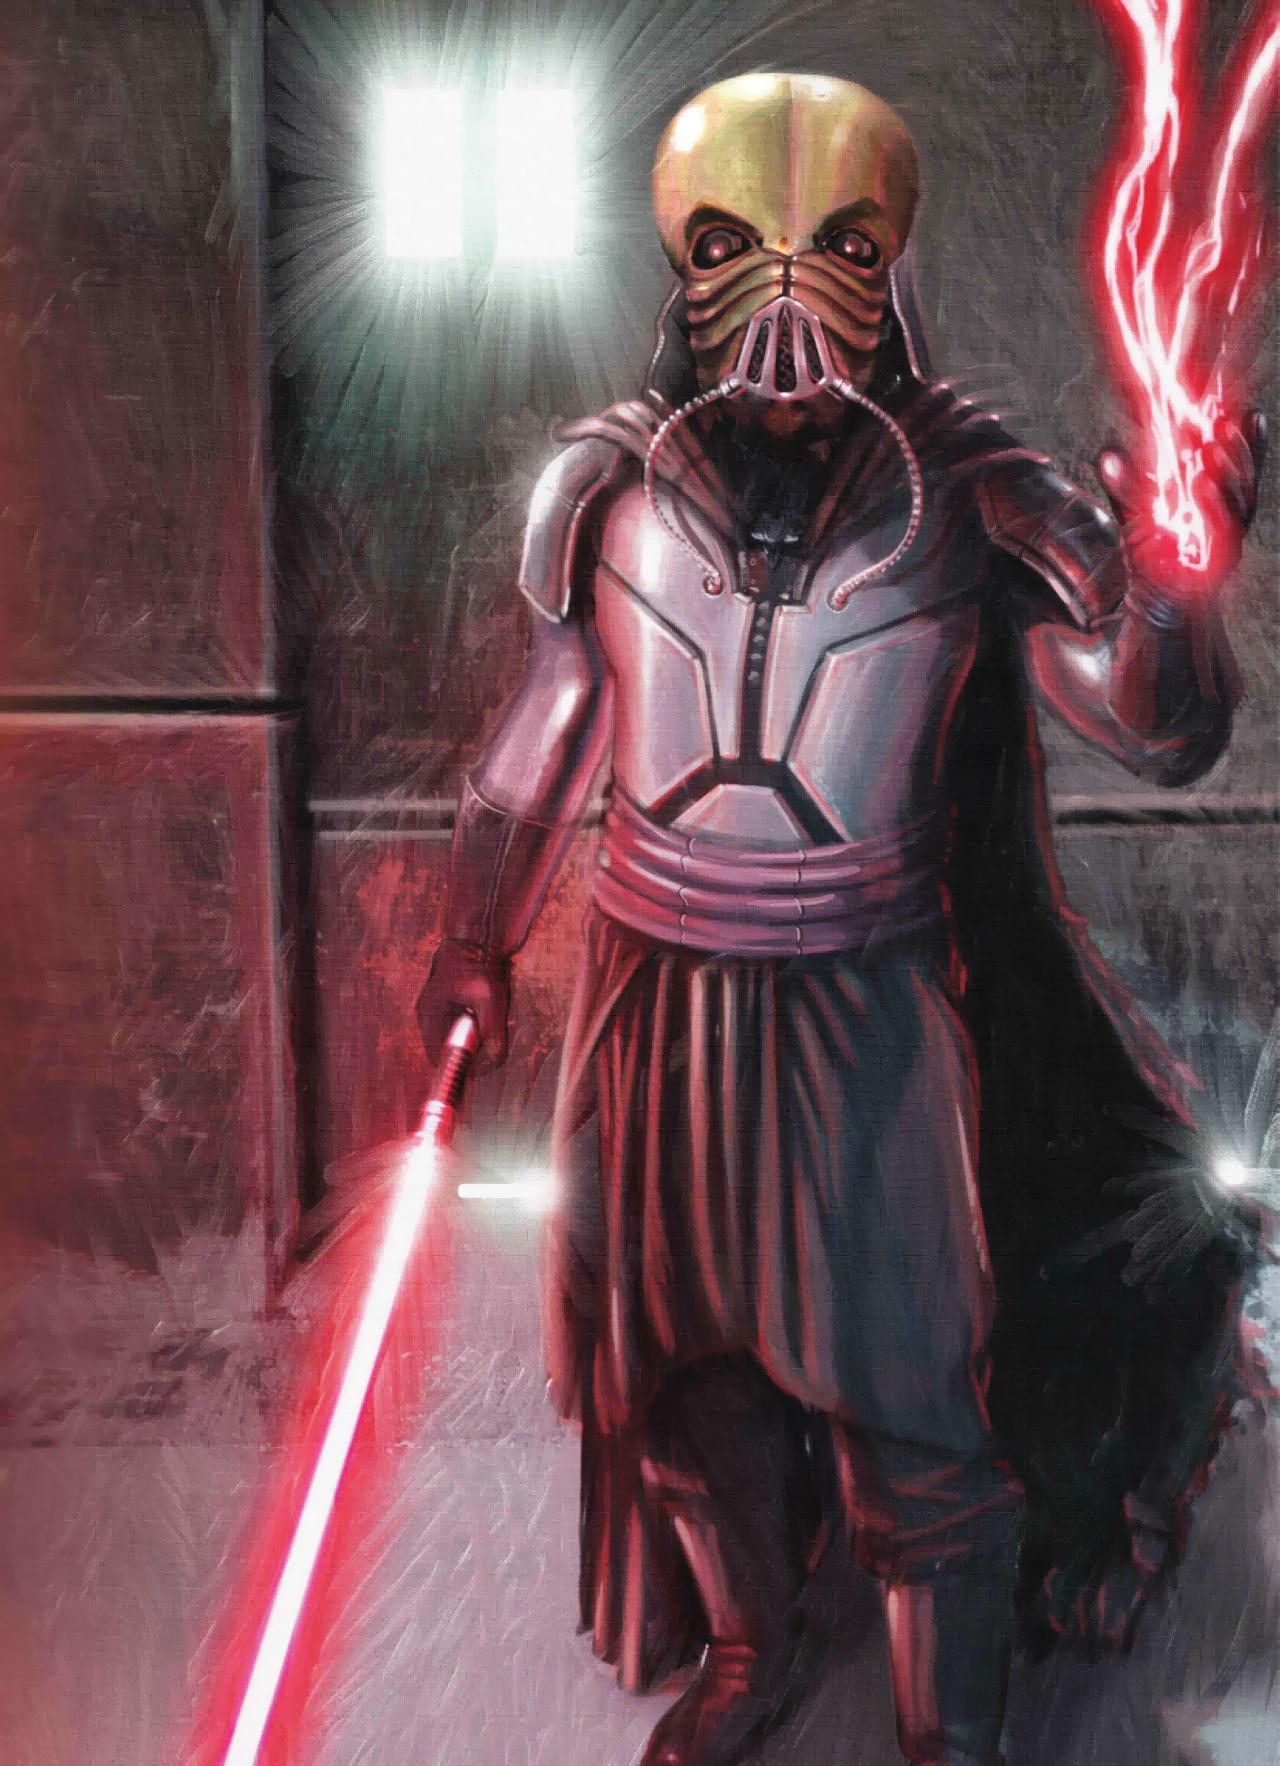 Darth Tenebrous's lightsaber